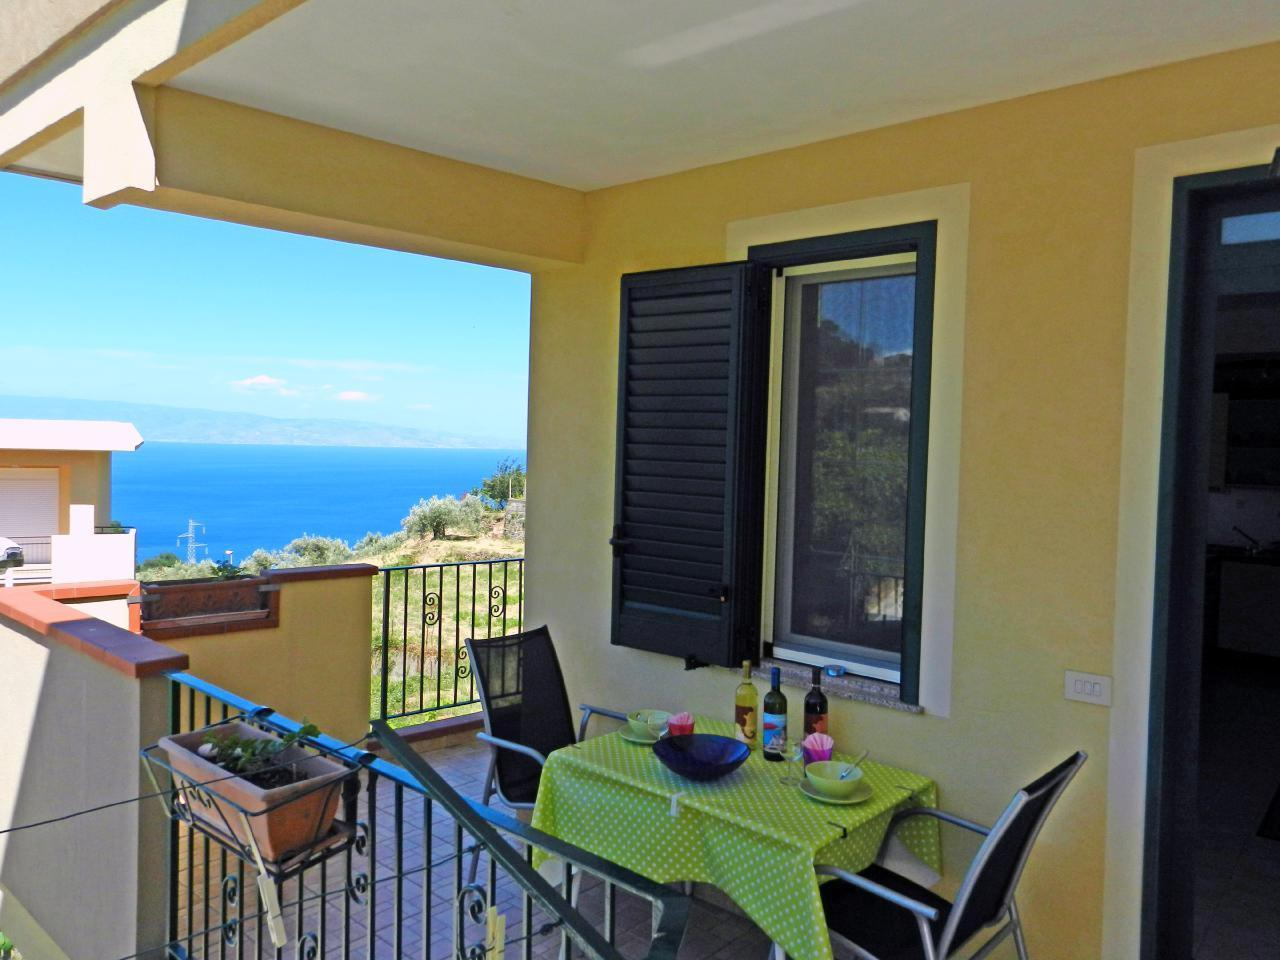 Holiday apartment Fewo mit Balkon im Panorama-Dorf bei Taormina (737398), Forza d'Agro', Messina, Sicily, Italy, picture 9